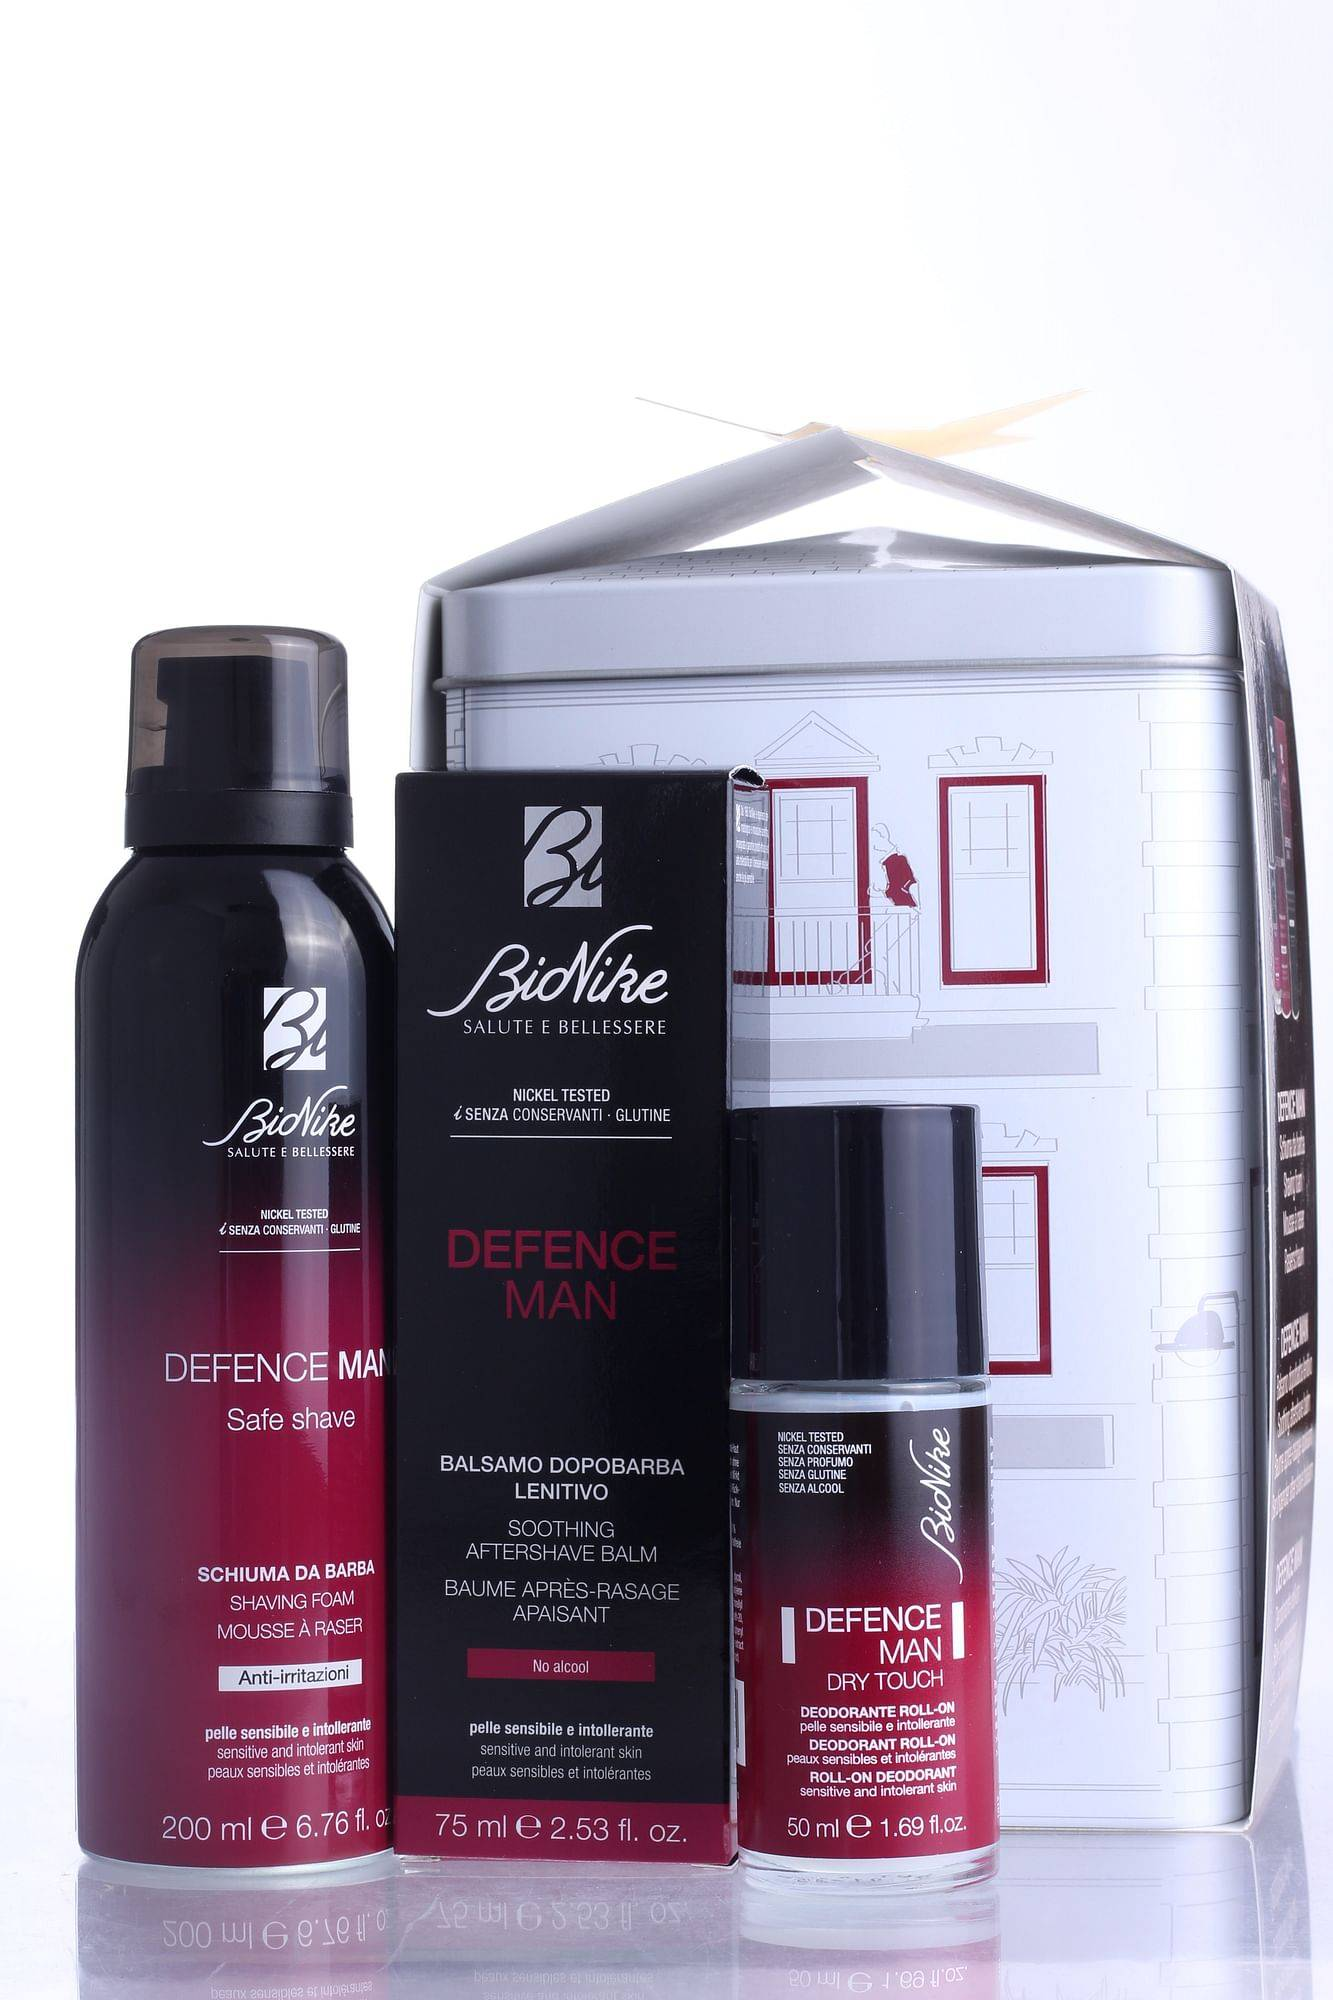 Bionike Defence Man Kit Natale 2020 1 Safe Shave Schiuma Barba Antiirritazioni 200 Ml +